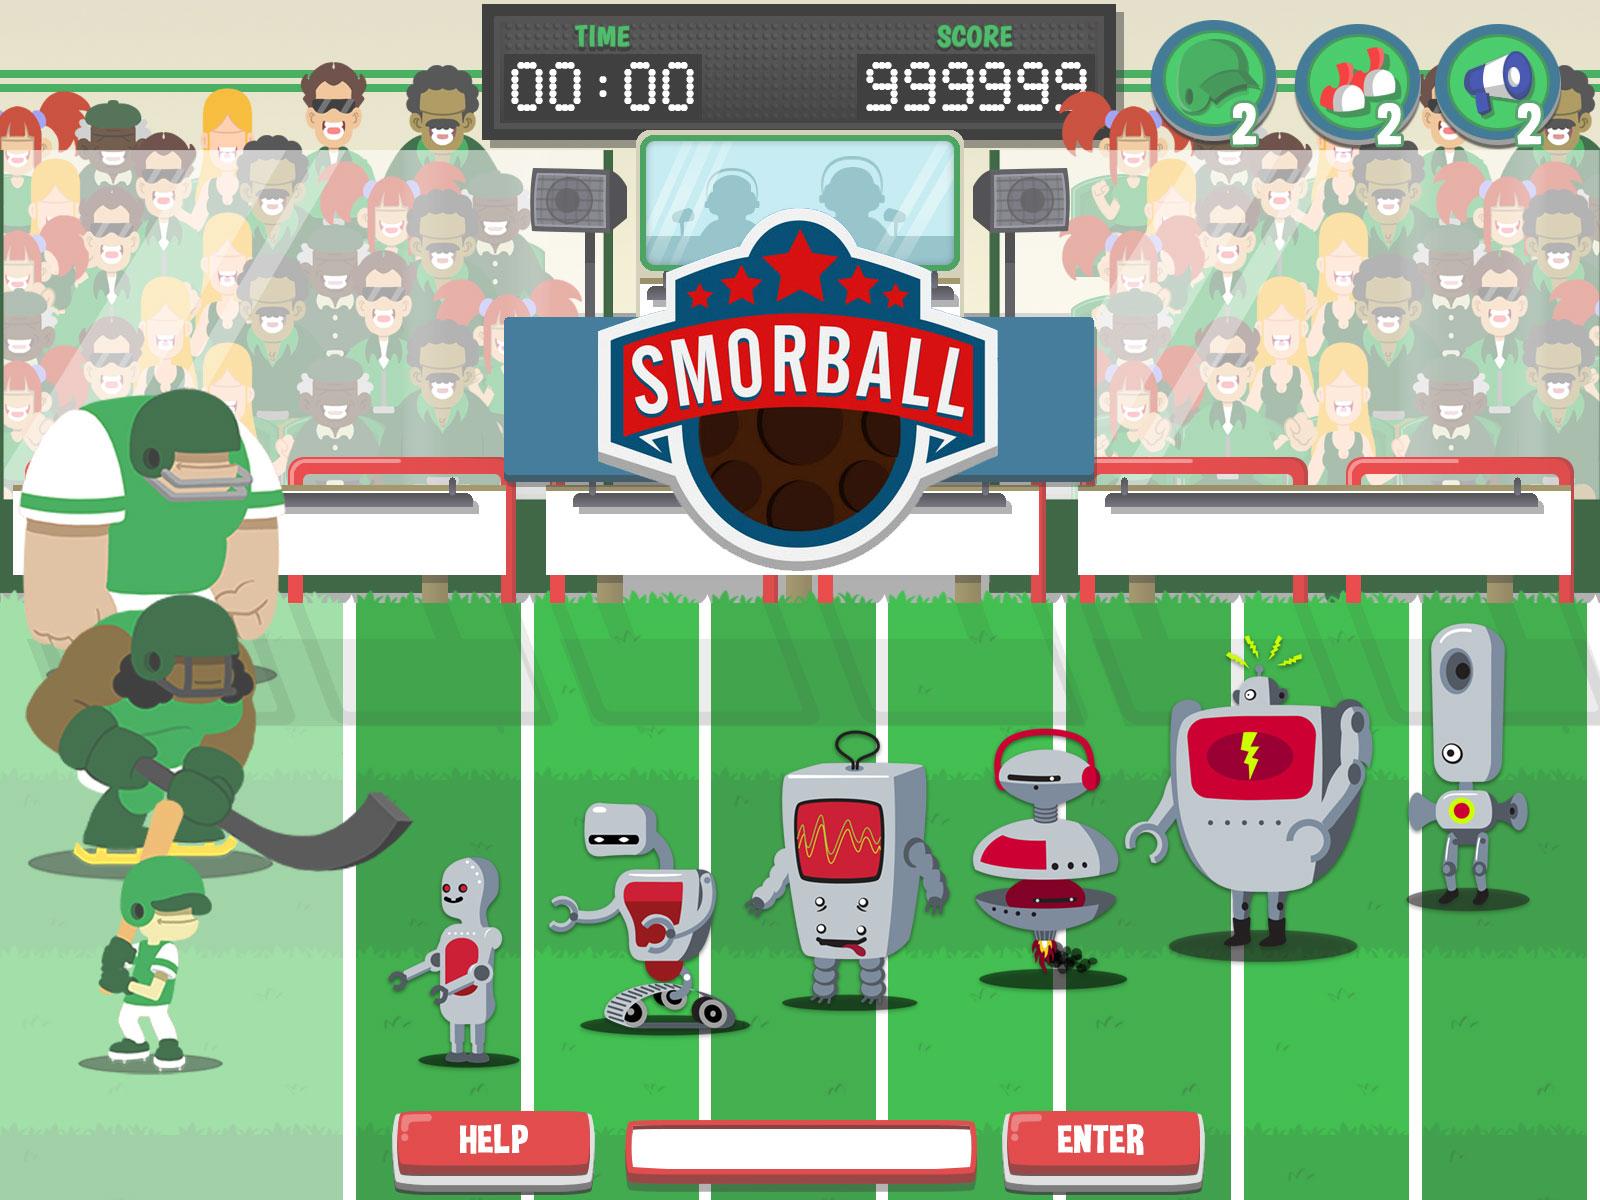 Smorball_Layout.jpg